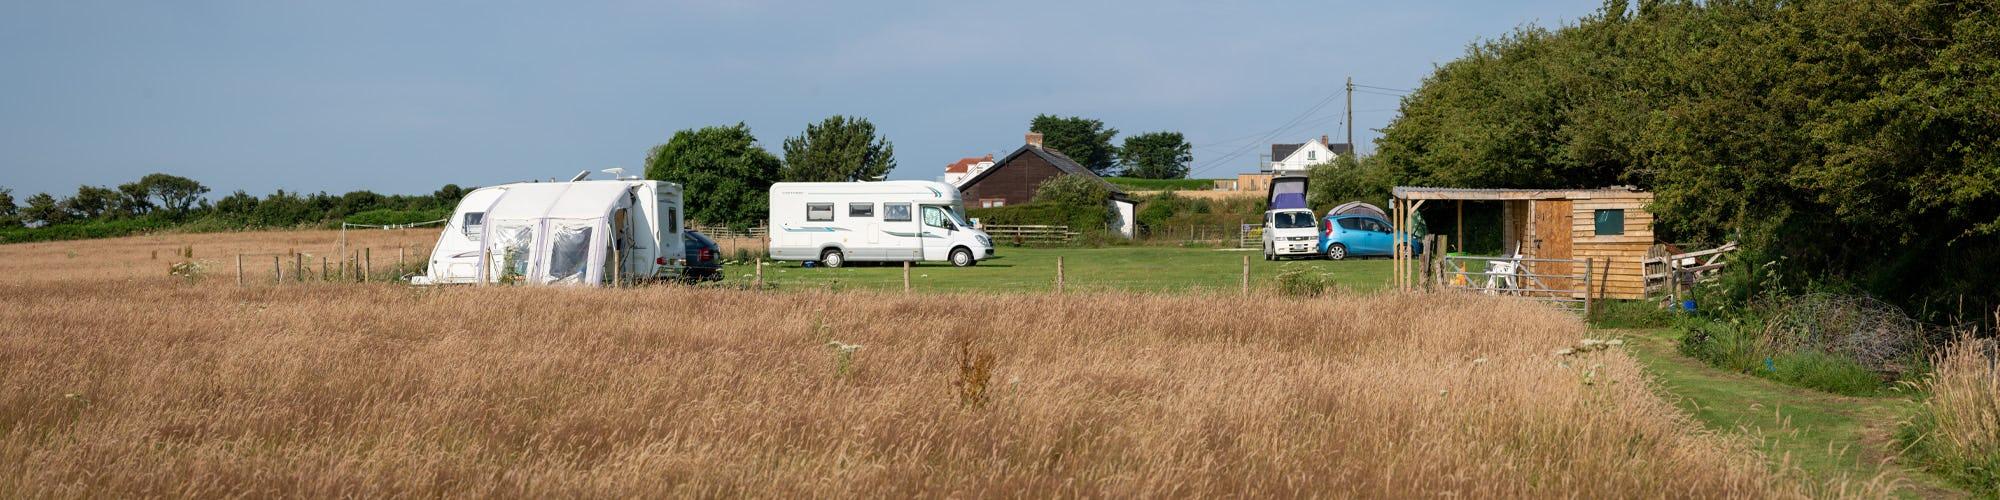 Resthaven Farm CL - Woolacombe, Ilfracombe, North Devon